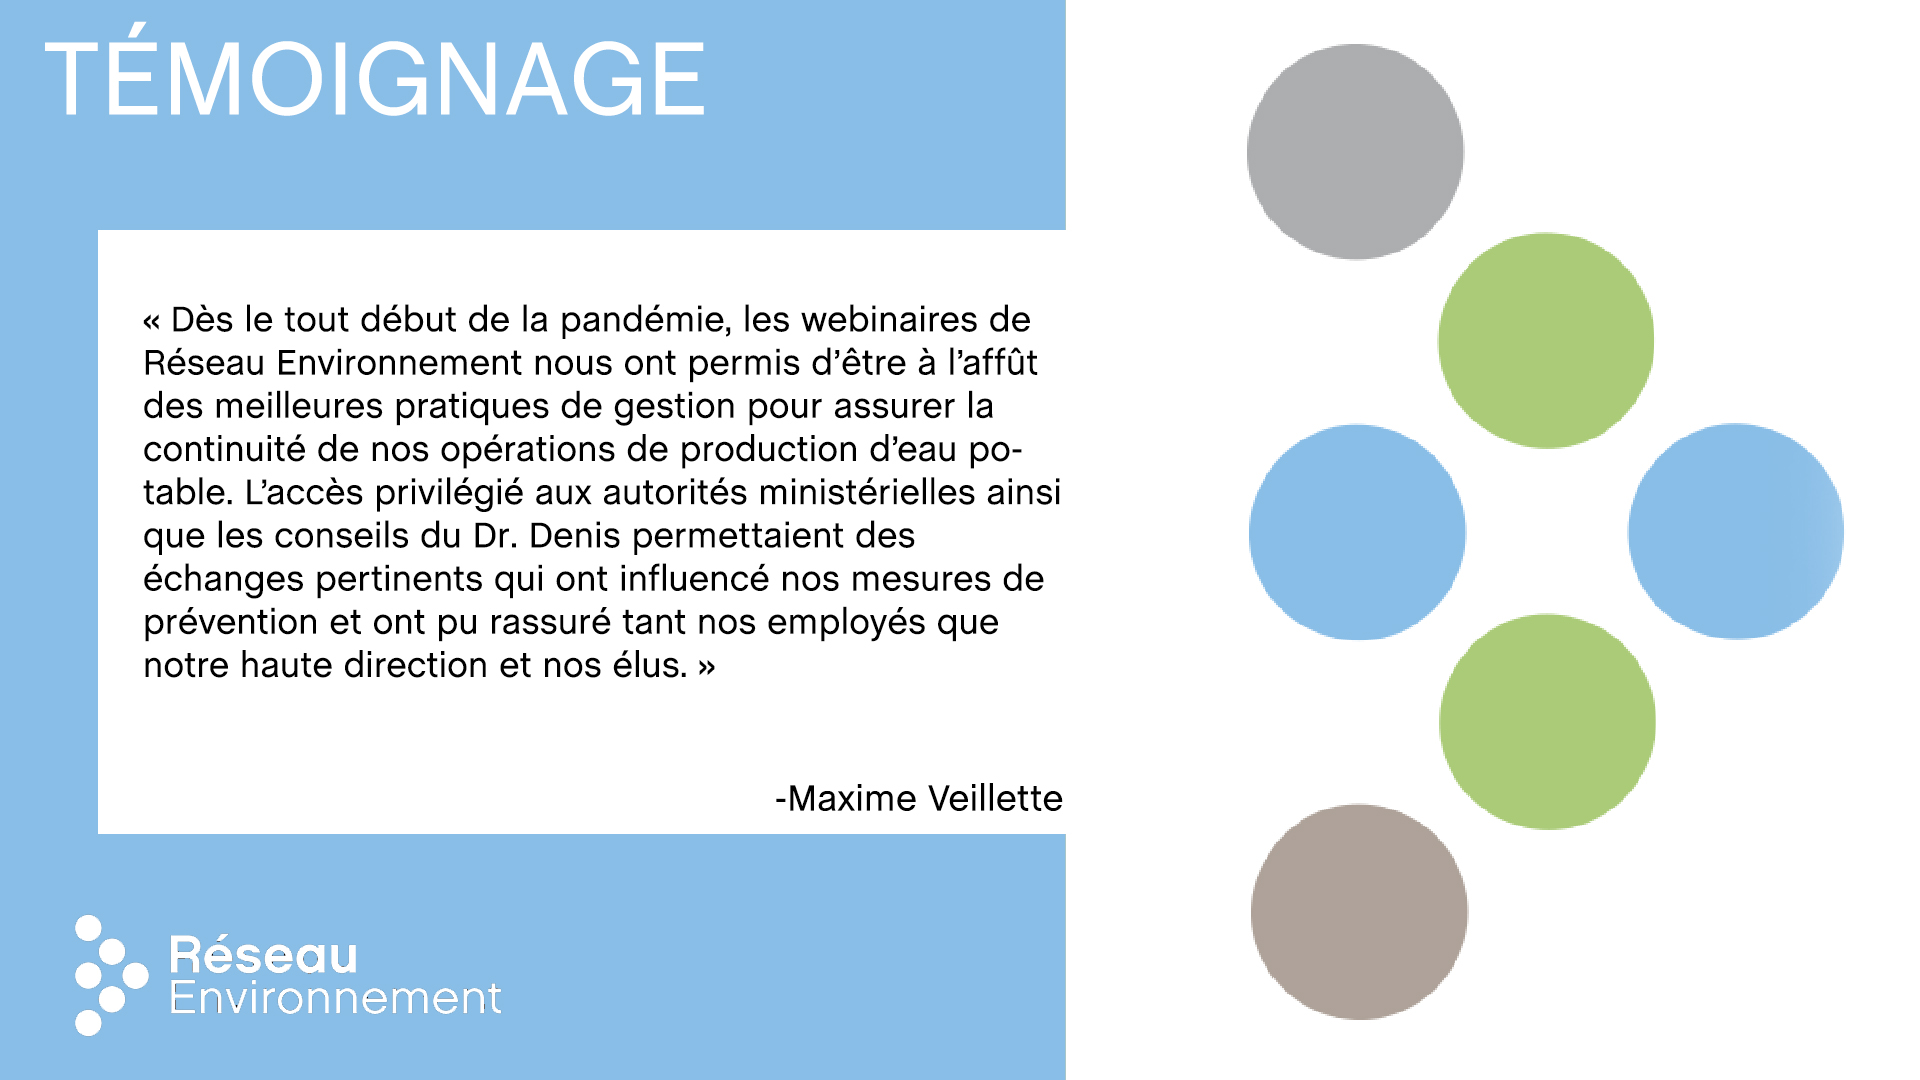 témoignage-Maxime-Veillette-1